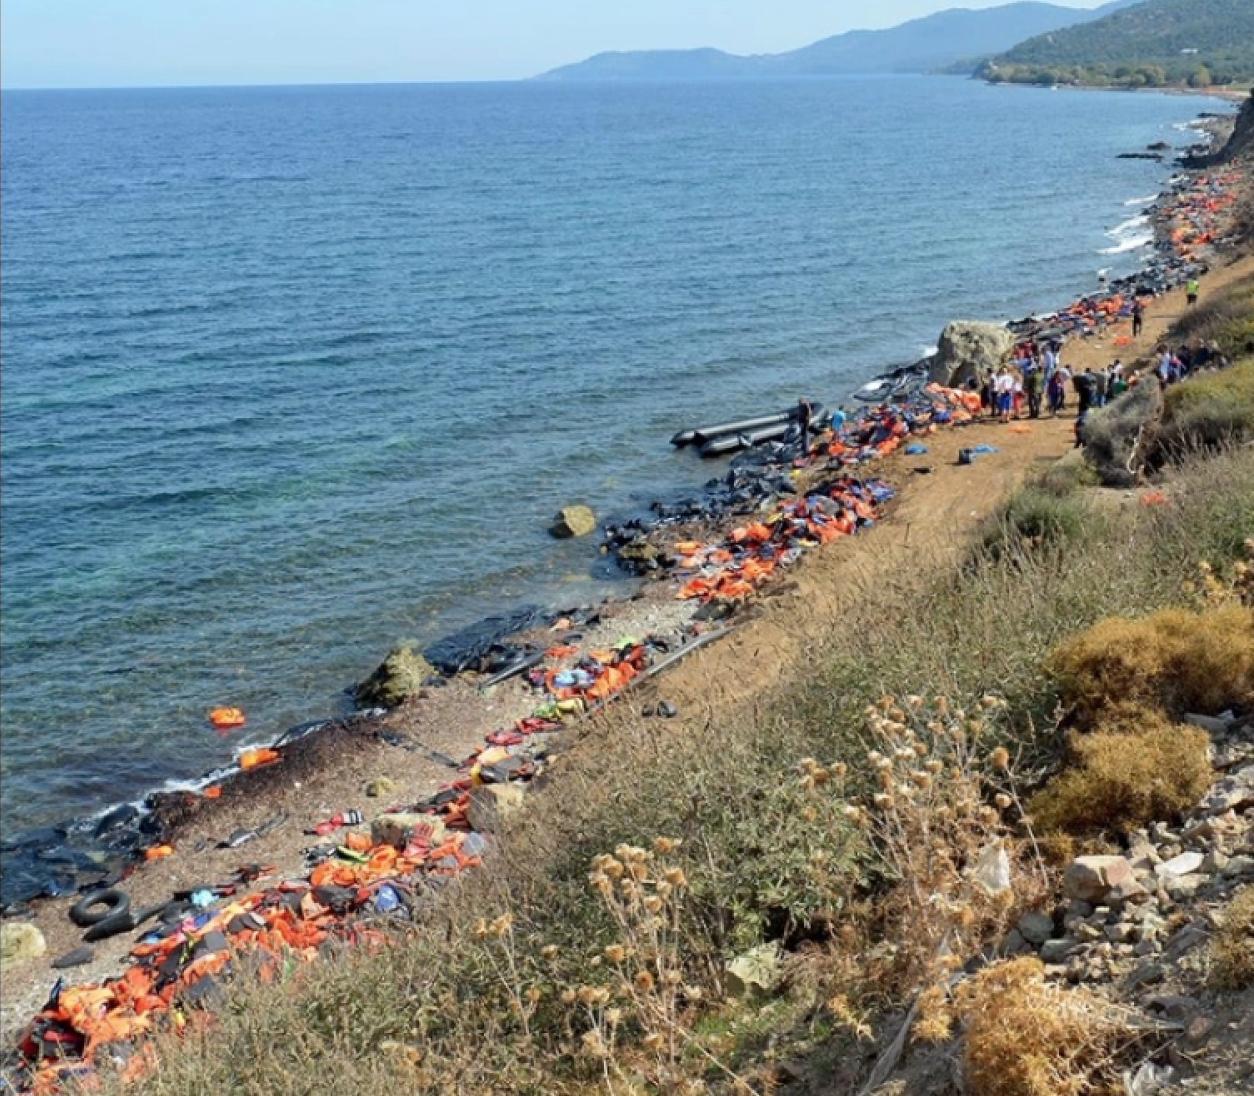 refugeecoast.png